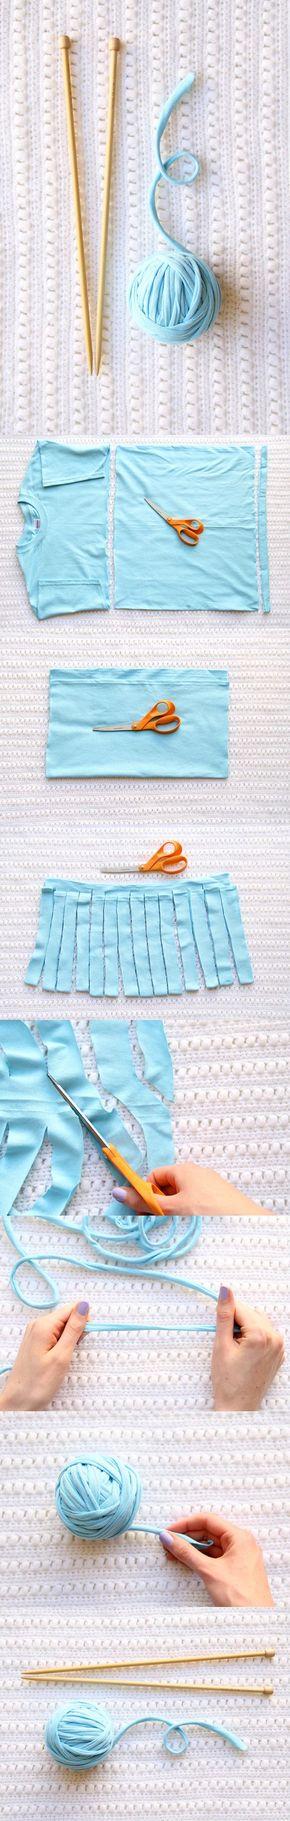 Como hacer trapillo >> sirve para bolsas plasticas tambien :D